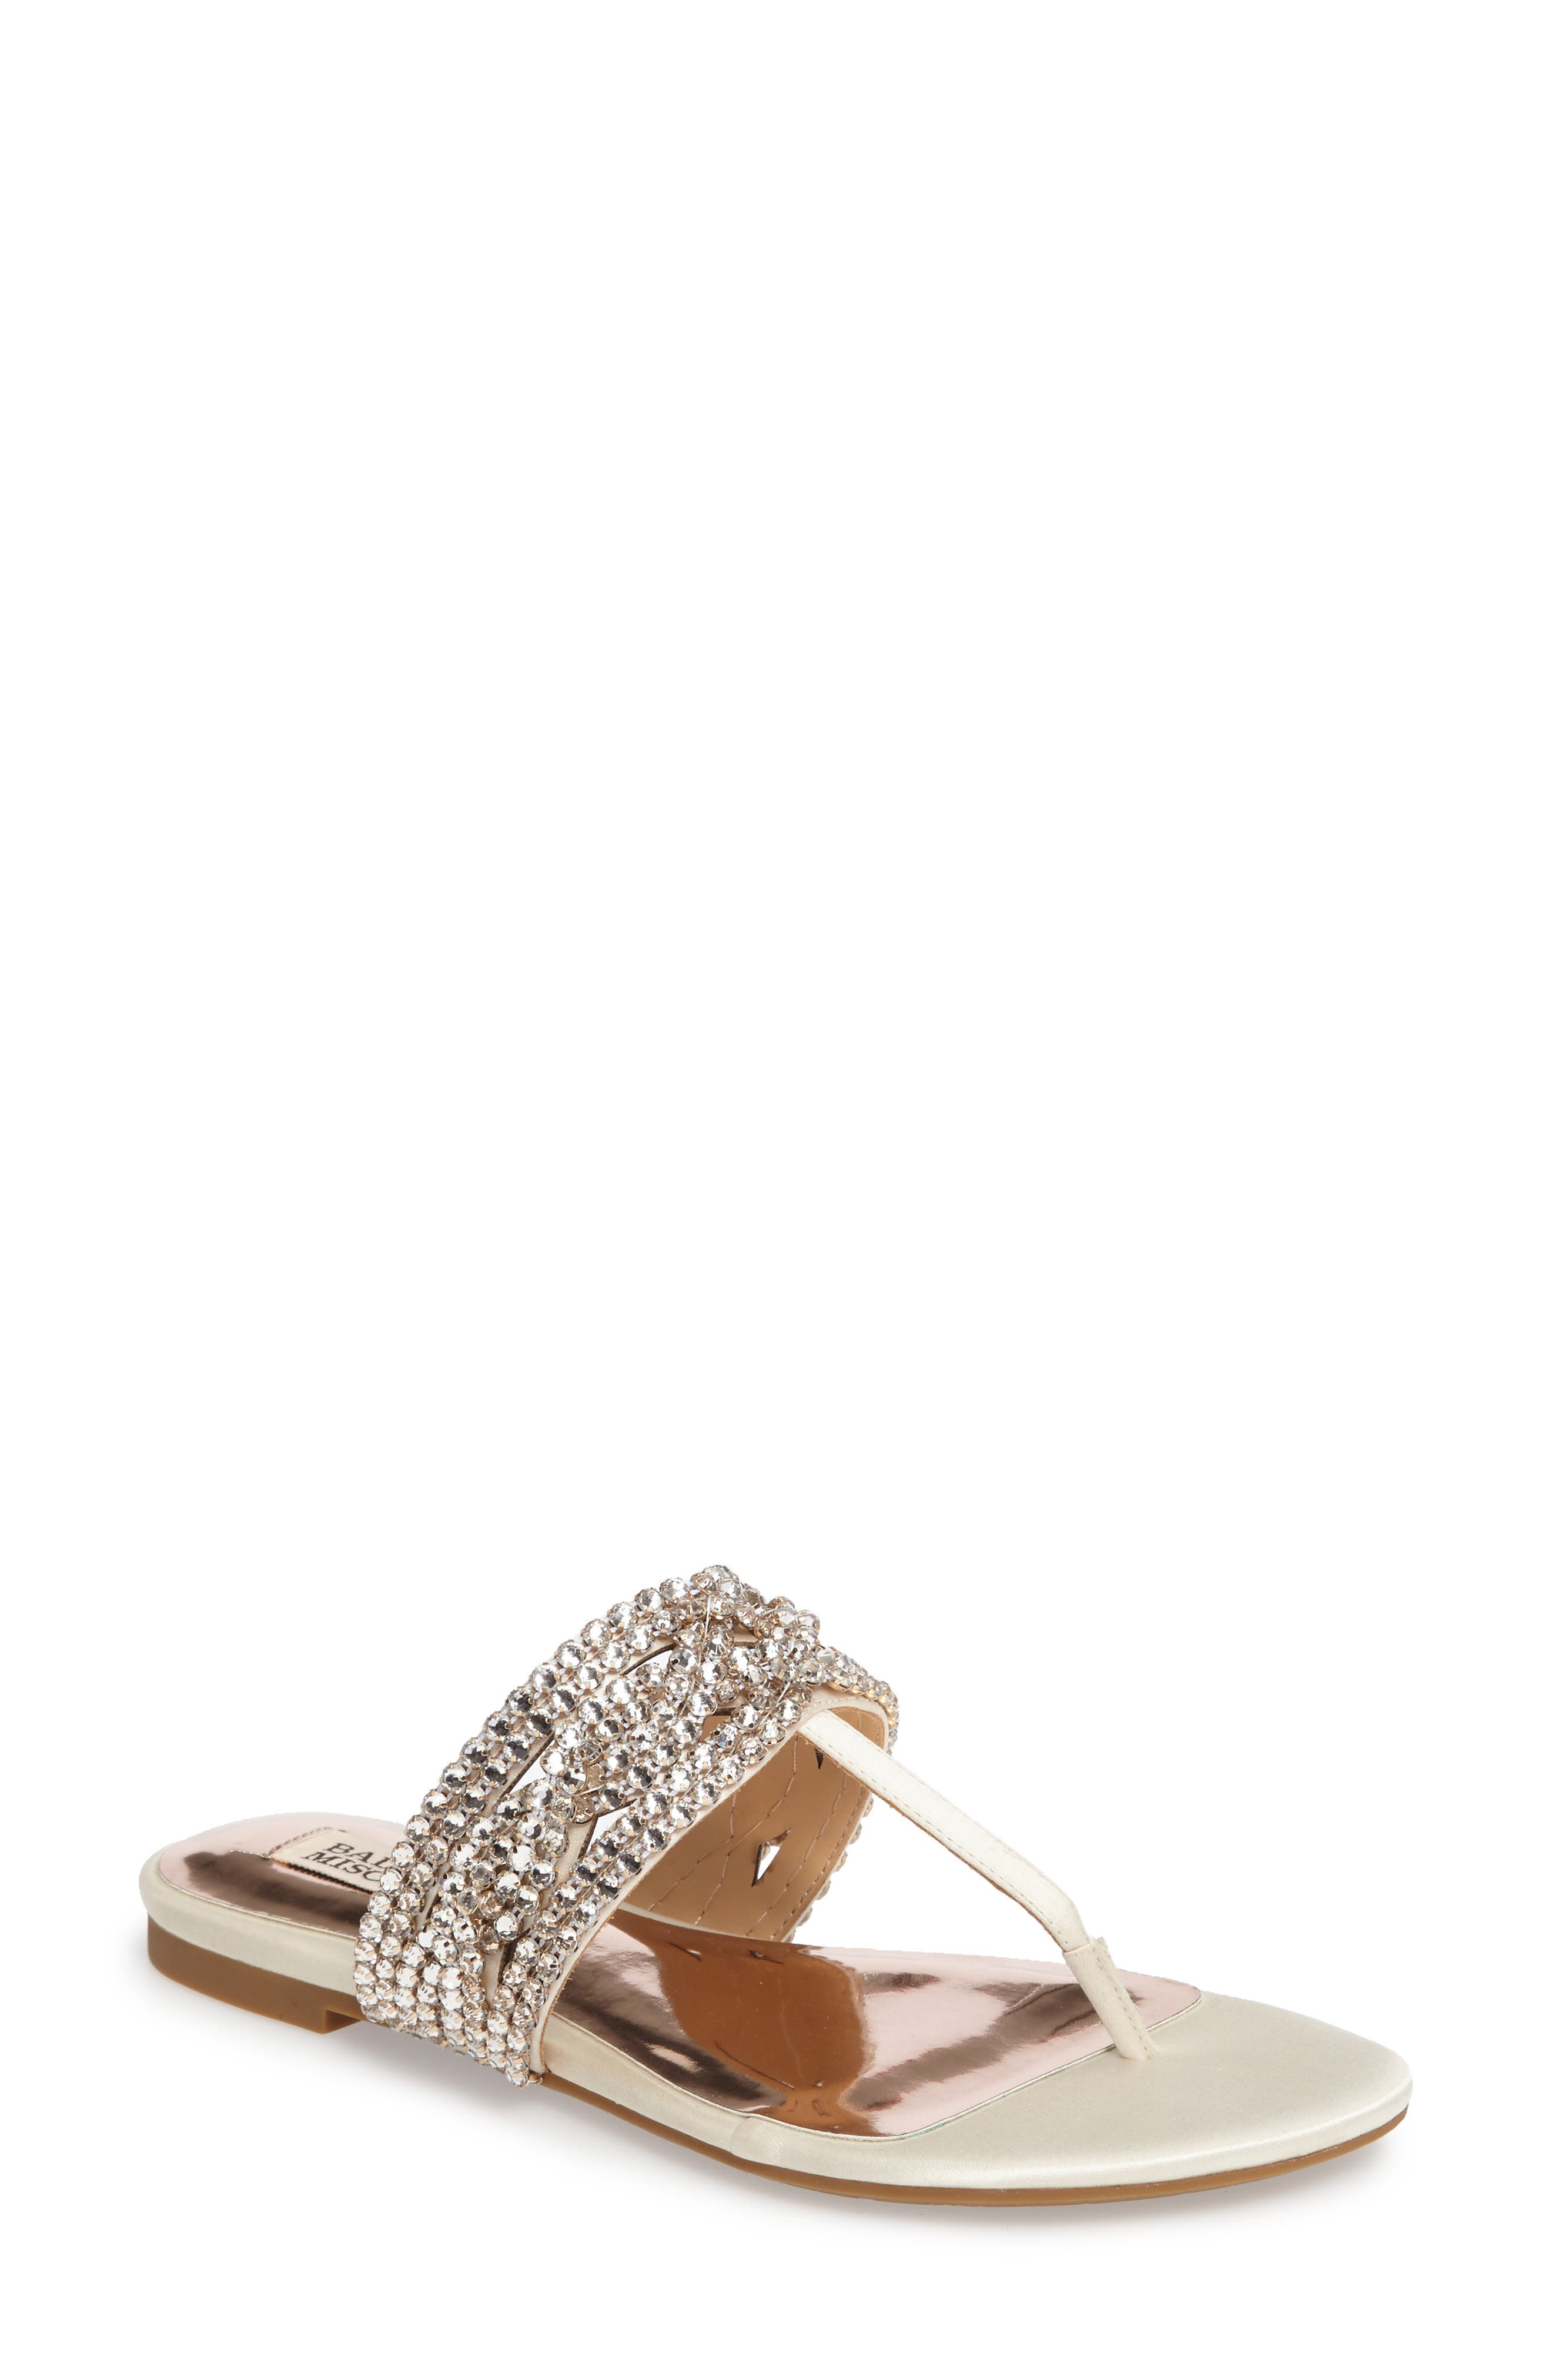 BADGLEY MISCHKA Trent Embellished Flat Sandal